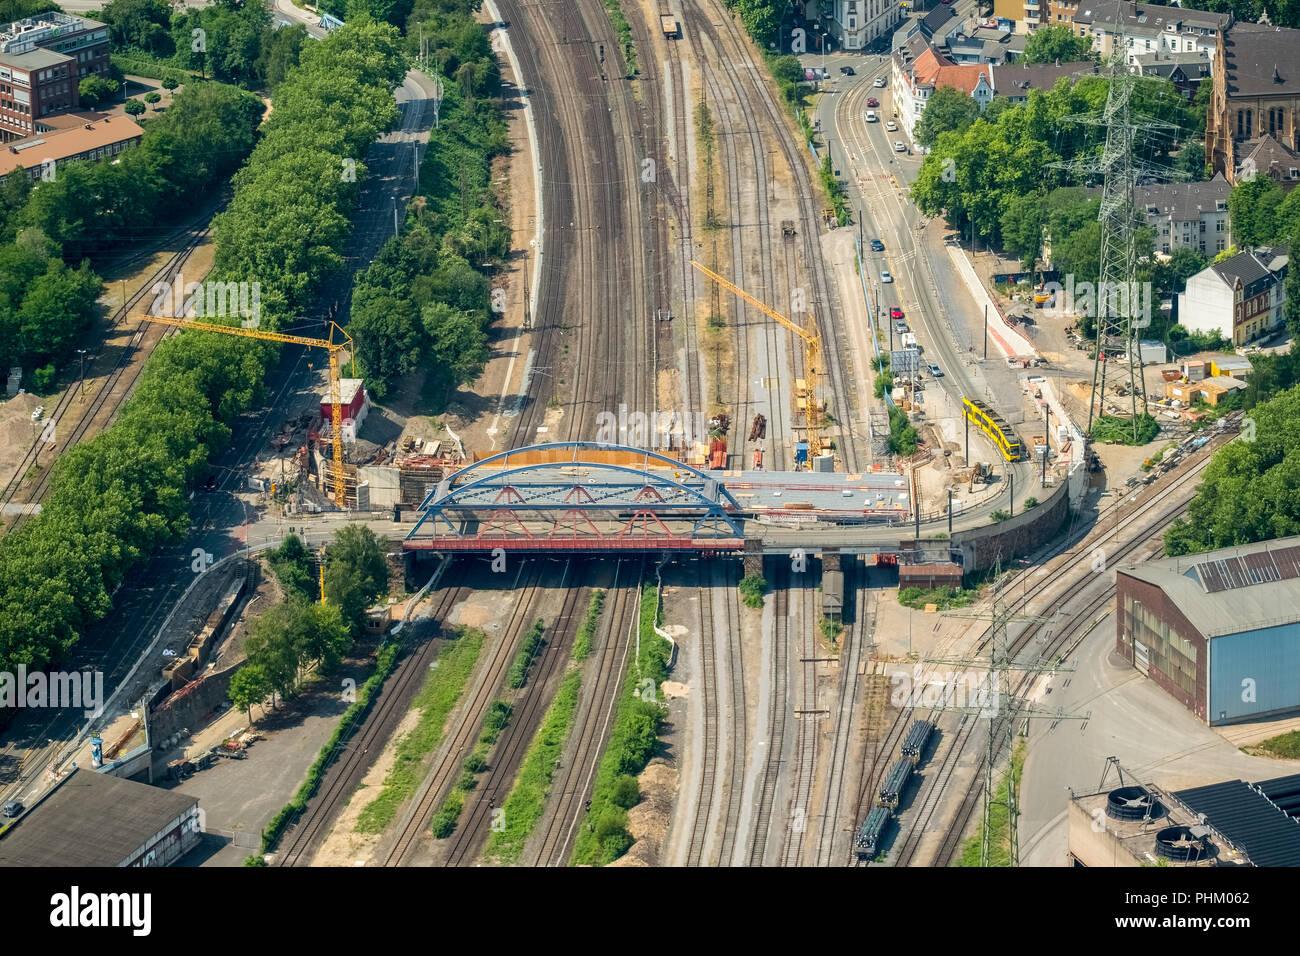 Aerial view, Mülheim Mitte with a view of Ruhrbania, Ruhr promenade, Ruhr and Rathaus, StadtQuartier Schlossstraße, SQS 'Mülheim an der Ruhr, Ruhrgebi - Stock Image